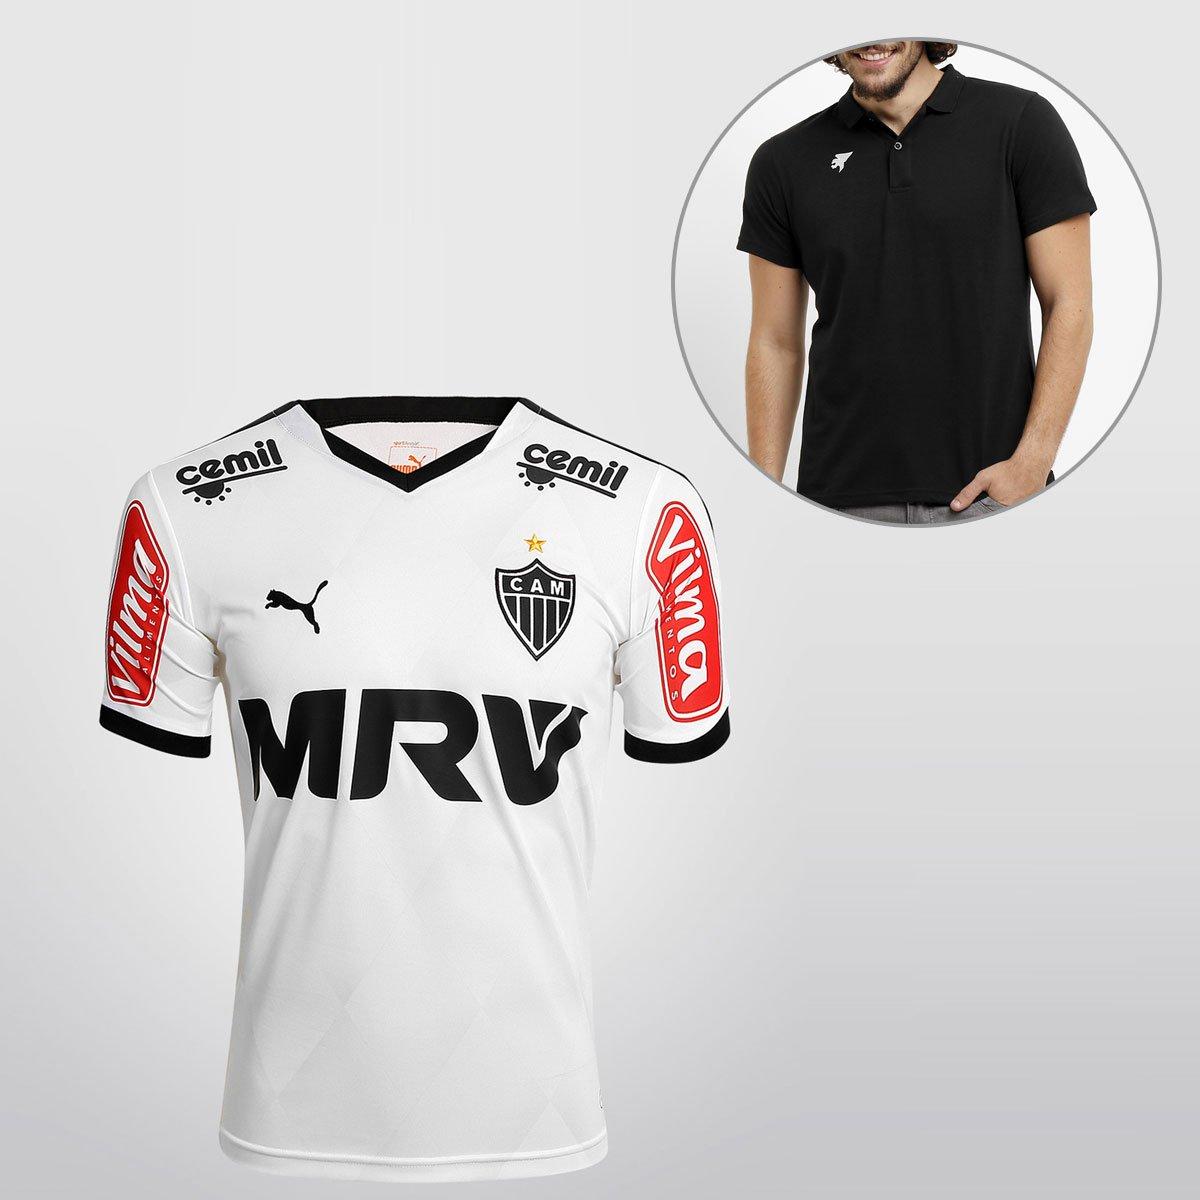 2d5d0aa70c Camisa Puma Atlético Mineiro II 2015 s nº + Camisa Polo Joma - Compre Agora